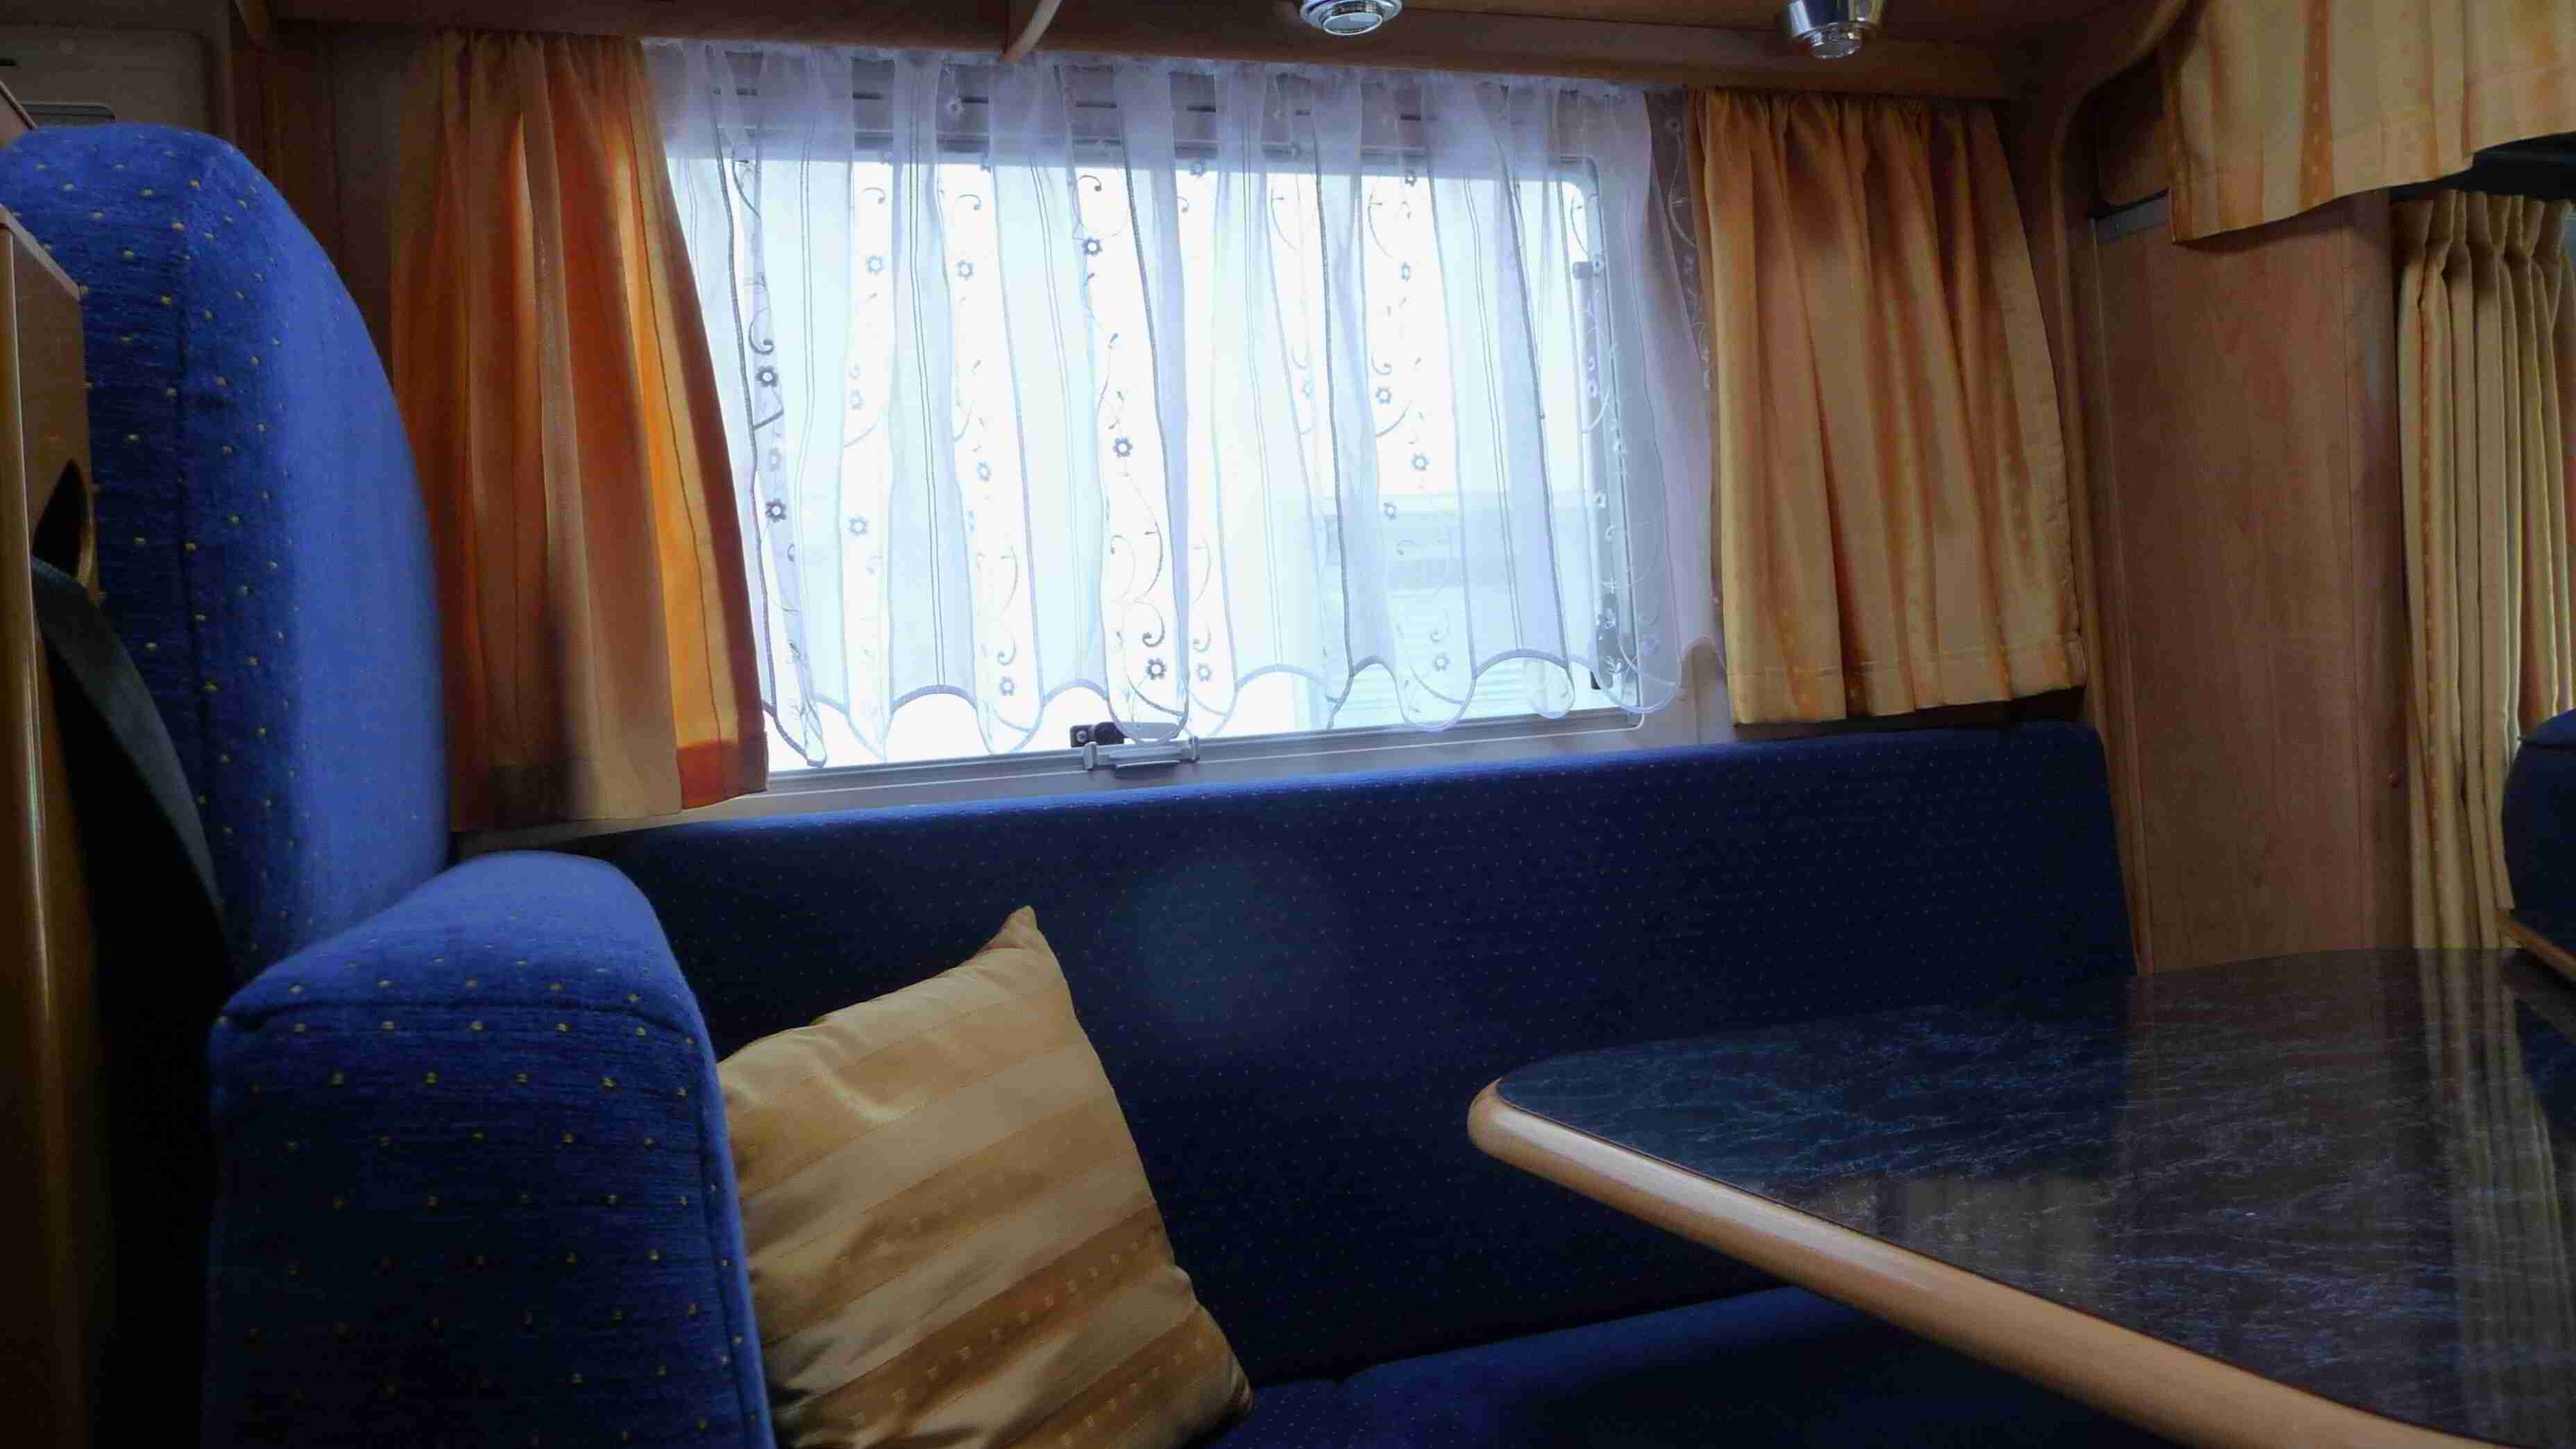 gardinen im womo wohnmobil forum. Black Bedroom Furniture Sets. Home Design Ideas